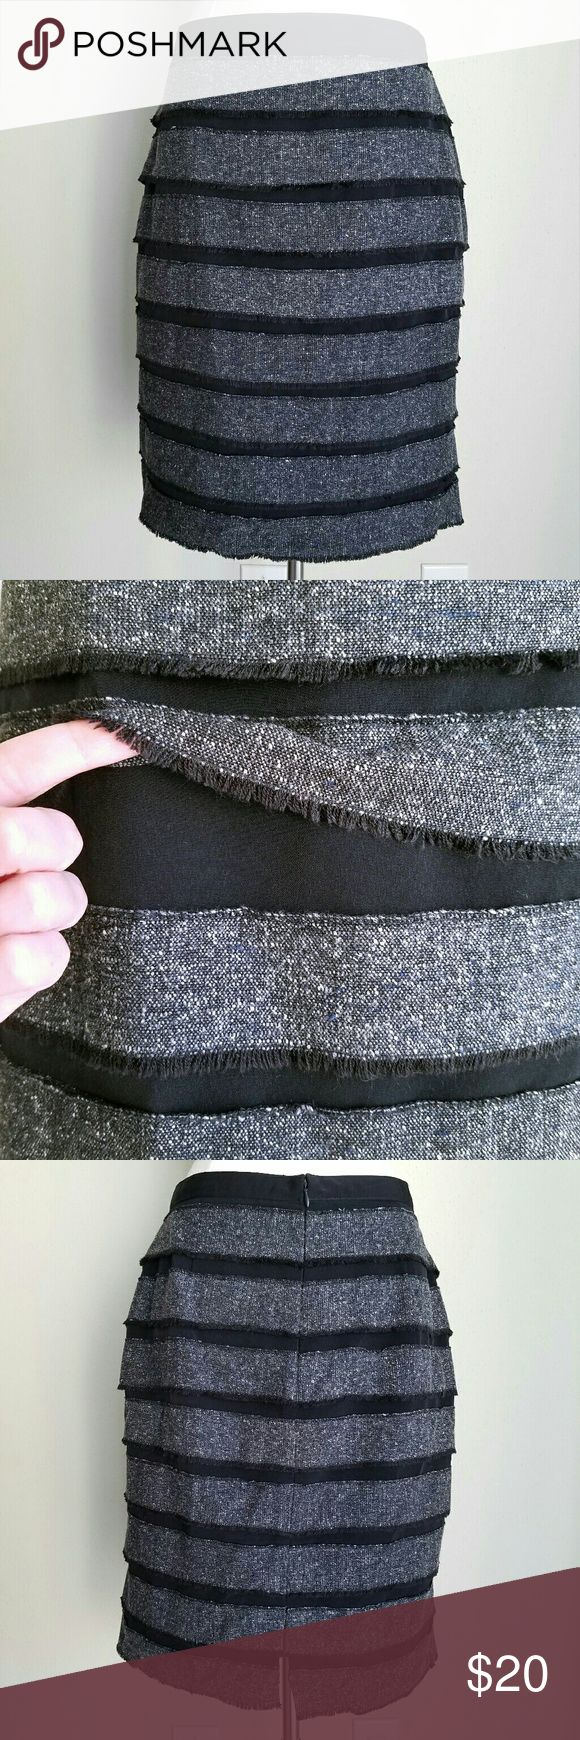 "Worthington Black & BlueDenim Layered Fringe Skirt Unique layered look in grayish blue jean/denim over dressy black fabric with slight sheen. Layers and hem have distressed fringe edges. Back zipper and hook closure. Back kickpleat slit. Full satin lining. Length (waist to hem)- 21.75"", Waist- 29"", Hip- 39"". Machine wash, tumble dry. Black- 100% polyester, Denim- 75% acrylic, 25% cotton. EXCELLENT used condition (very slight wear on waistband). Worthington Skirts Pencil"